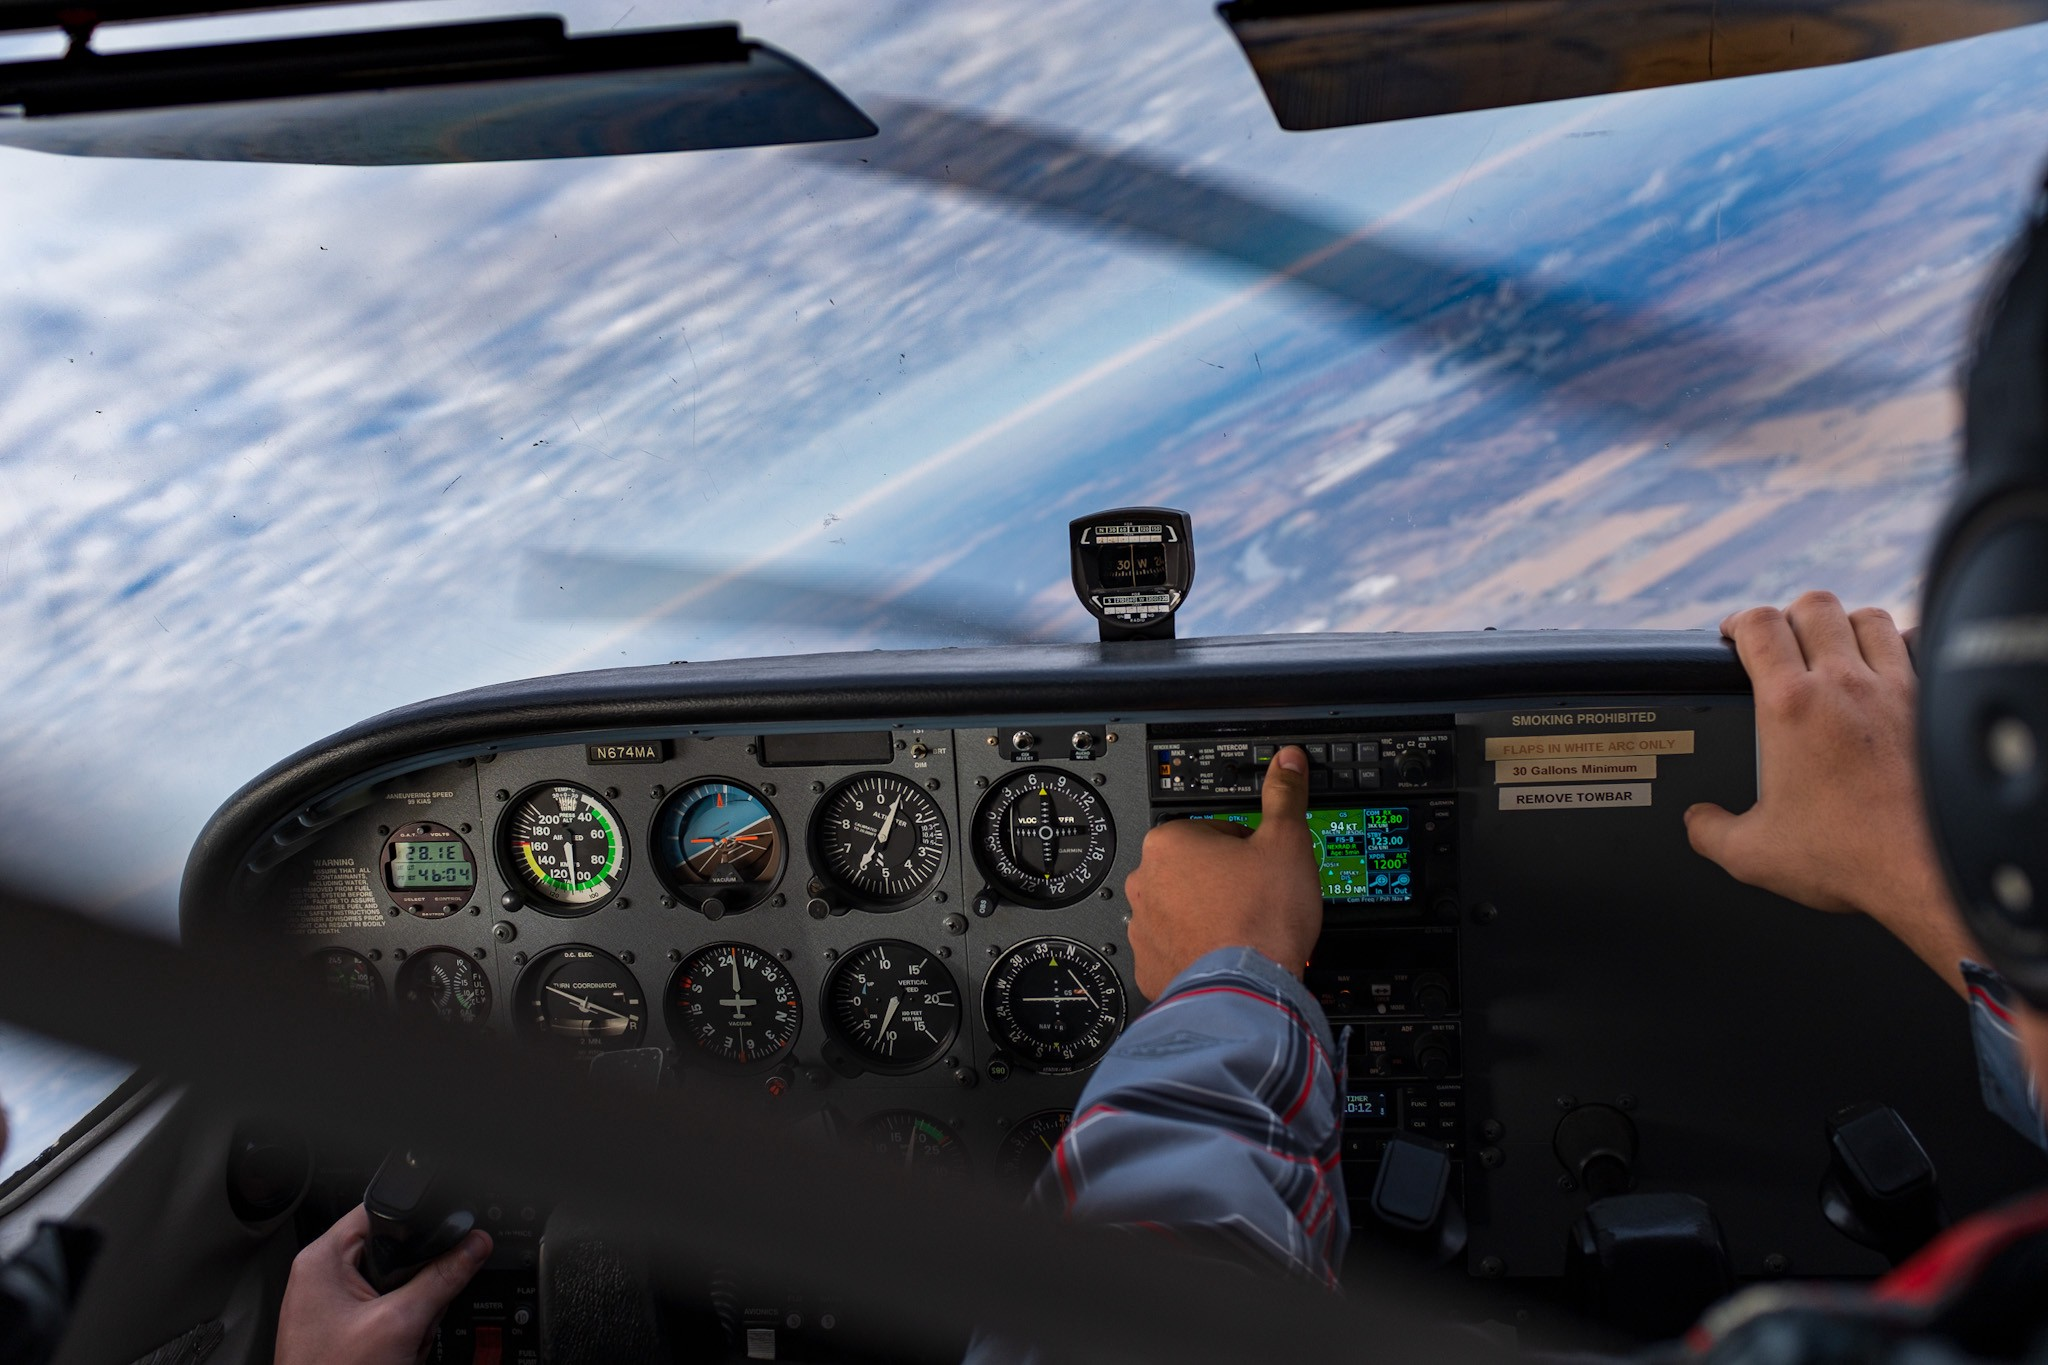 Cessna 172R cockpit in steep turn